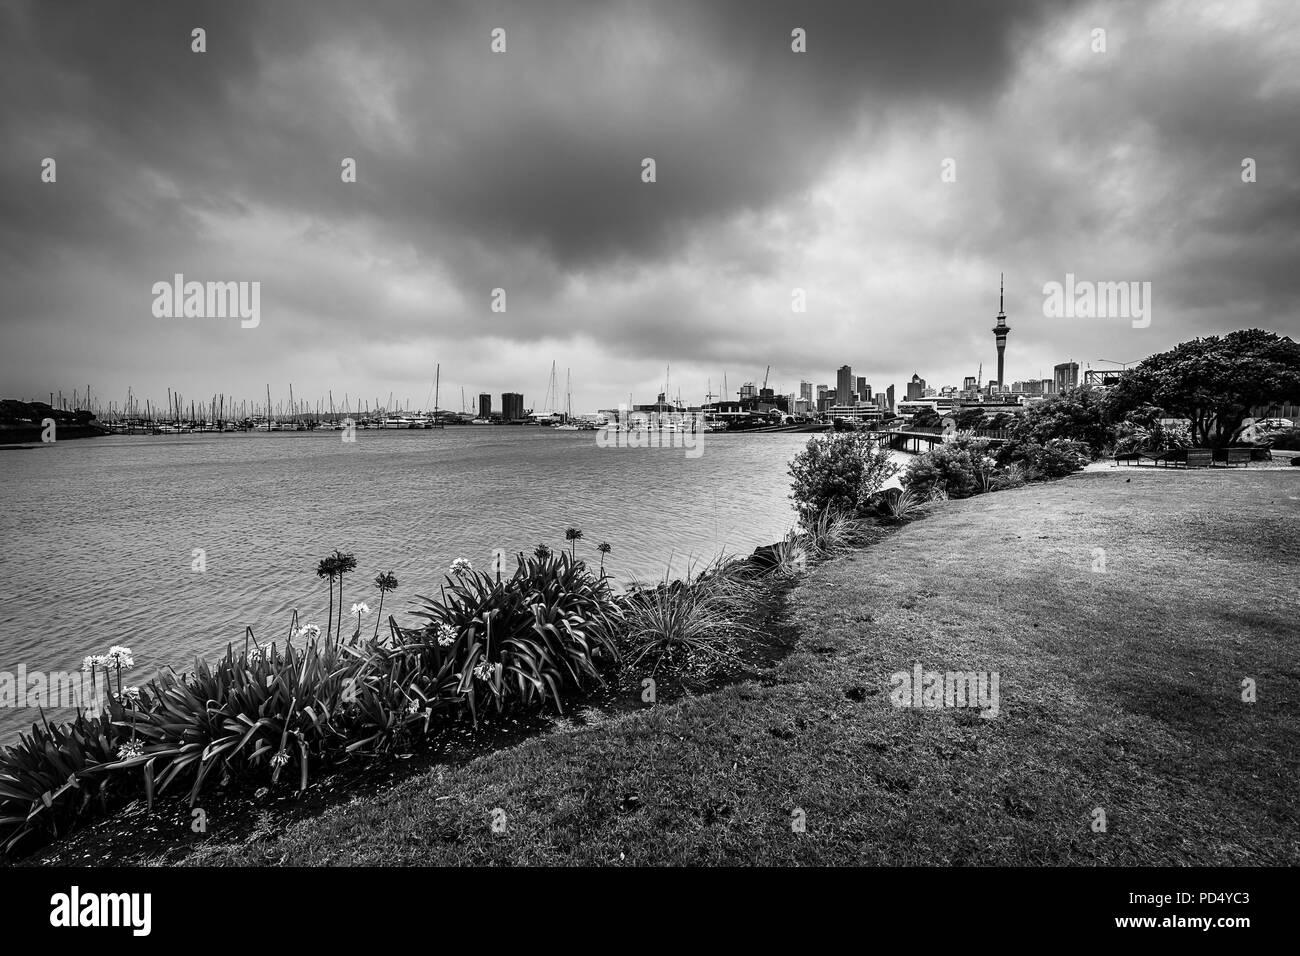 St. Mary's Bay, Auckland, New Zealand - Stock Image